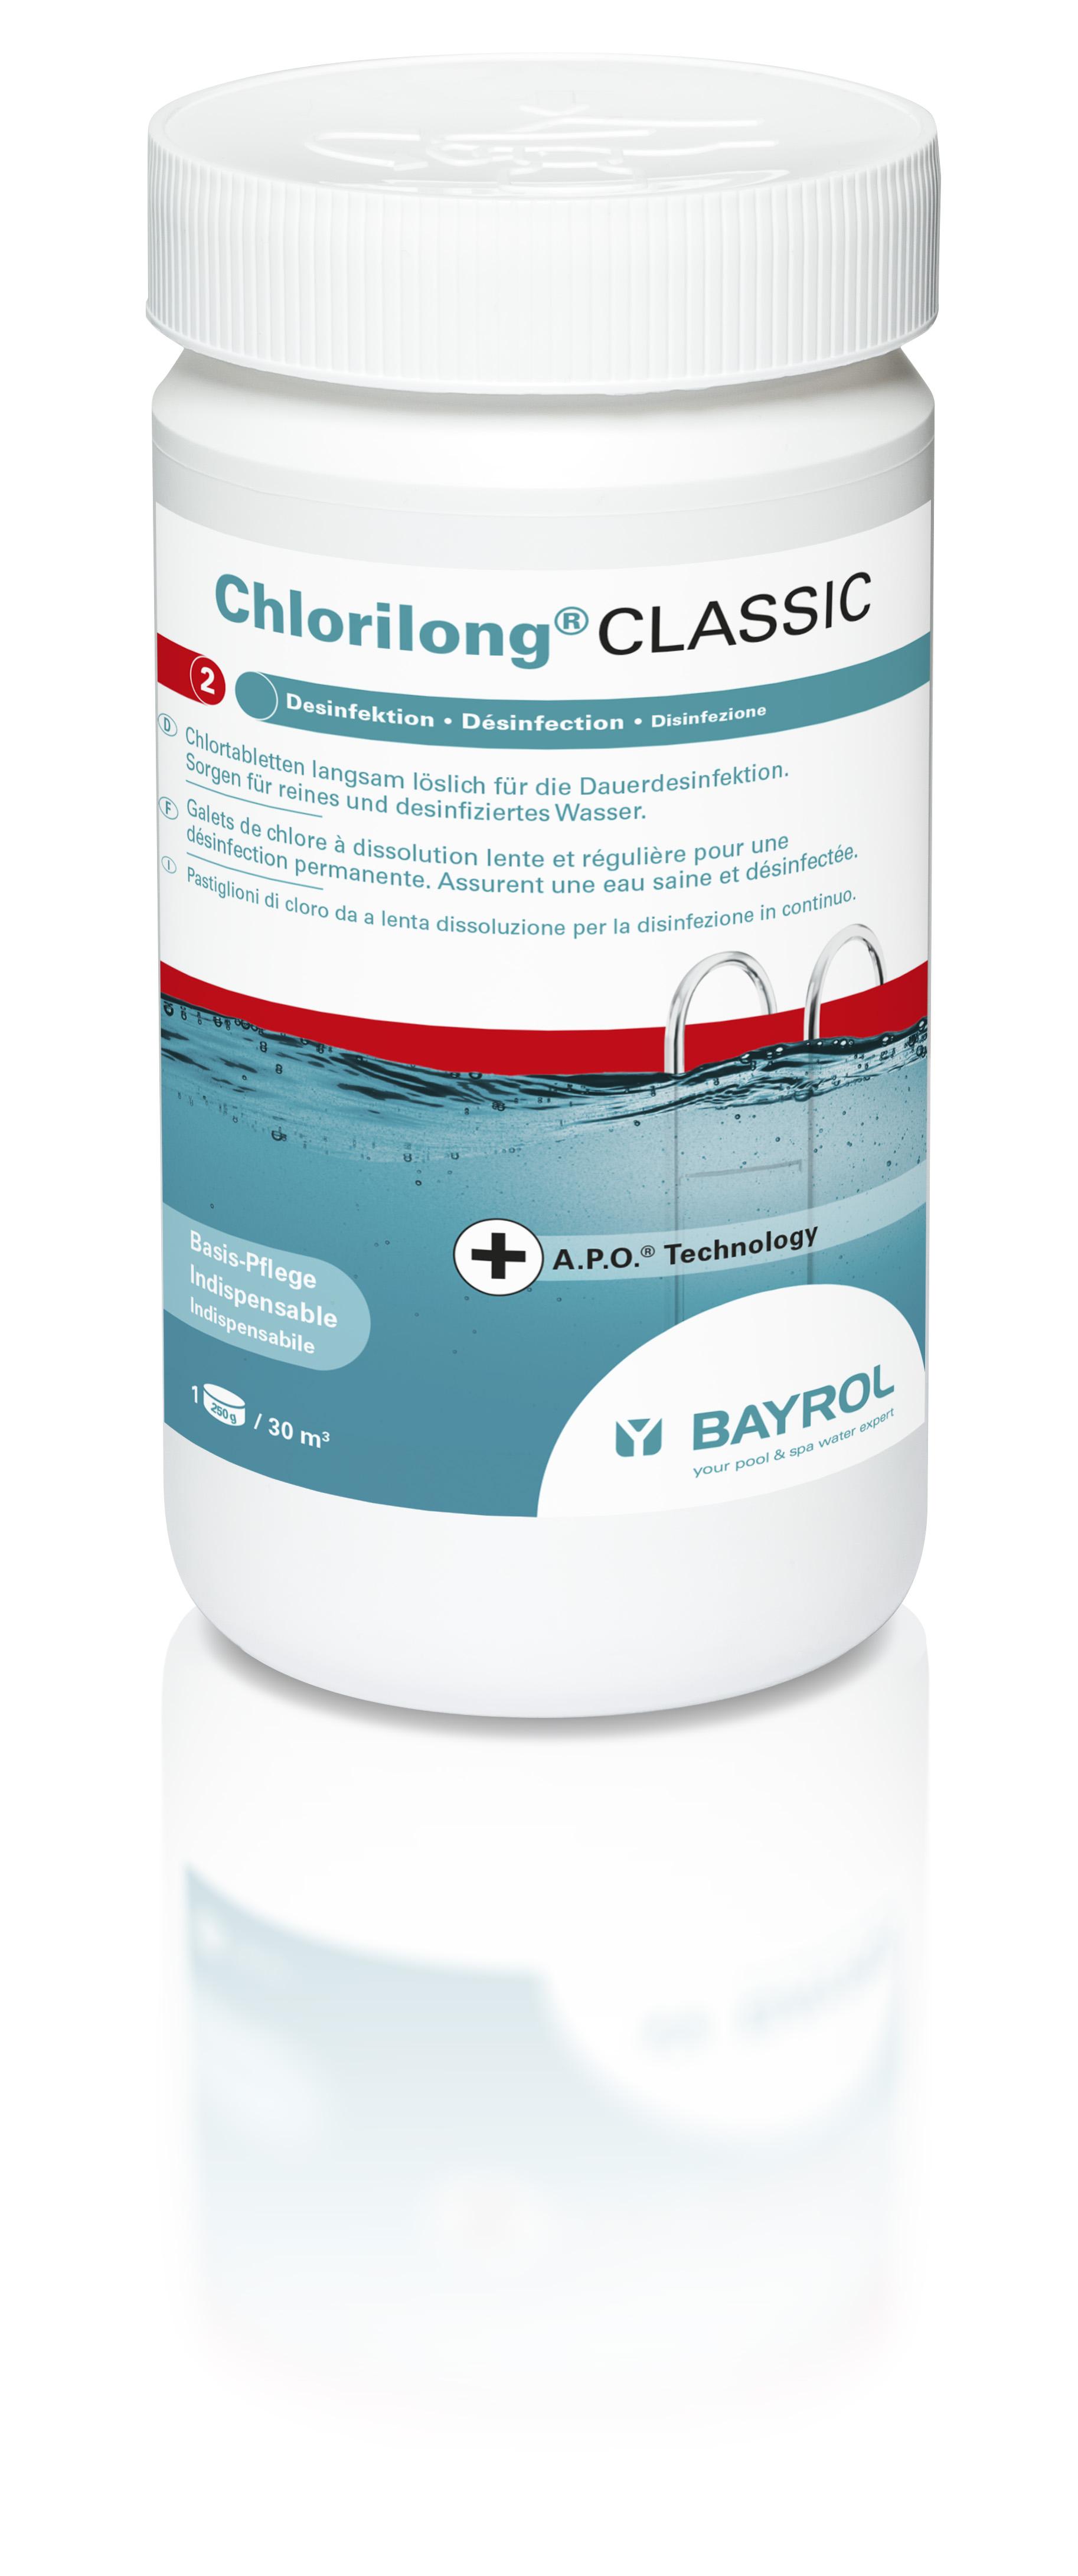 BAYROL Chlorilong Classic 1 kg - Restposten